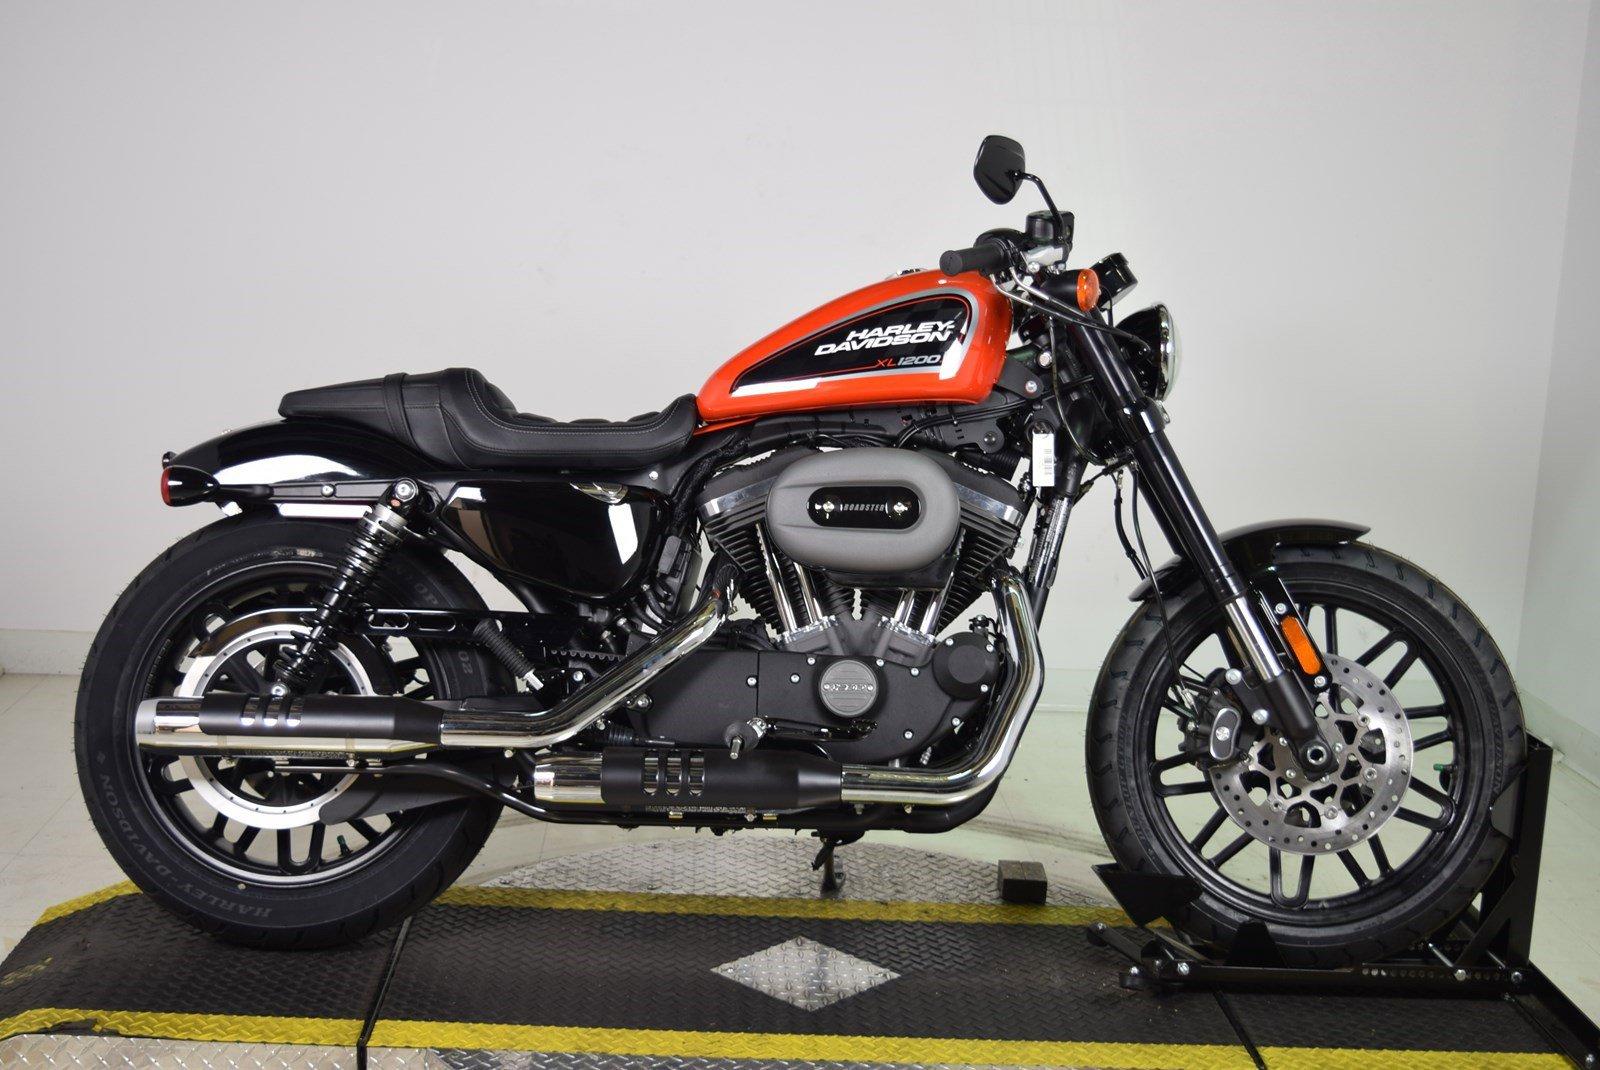 New 2020 Harley-Davidson Sportster Roadster XL1200CX